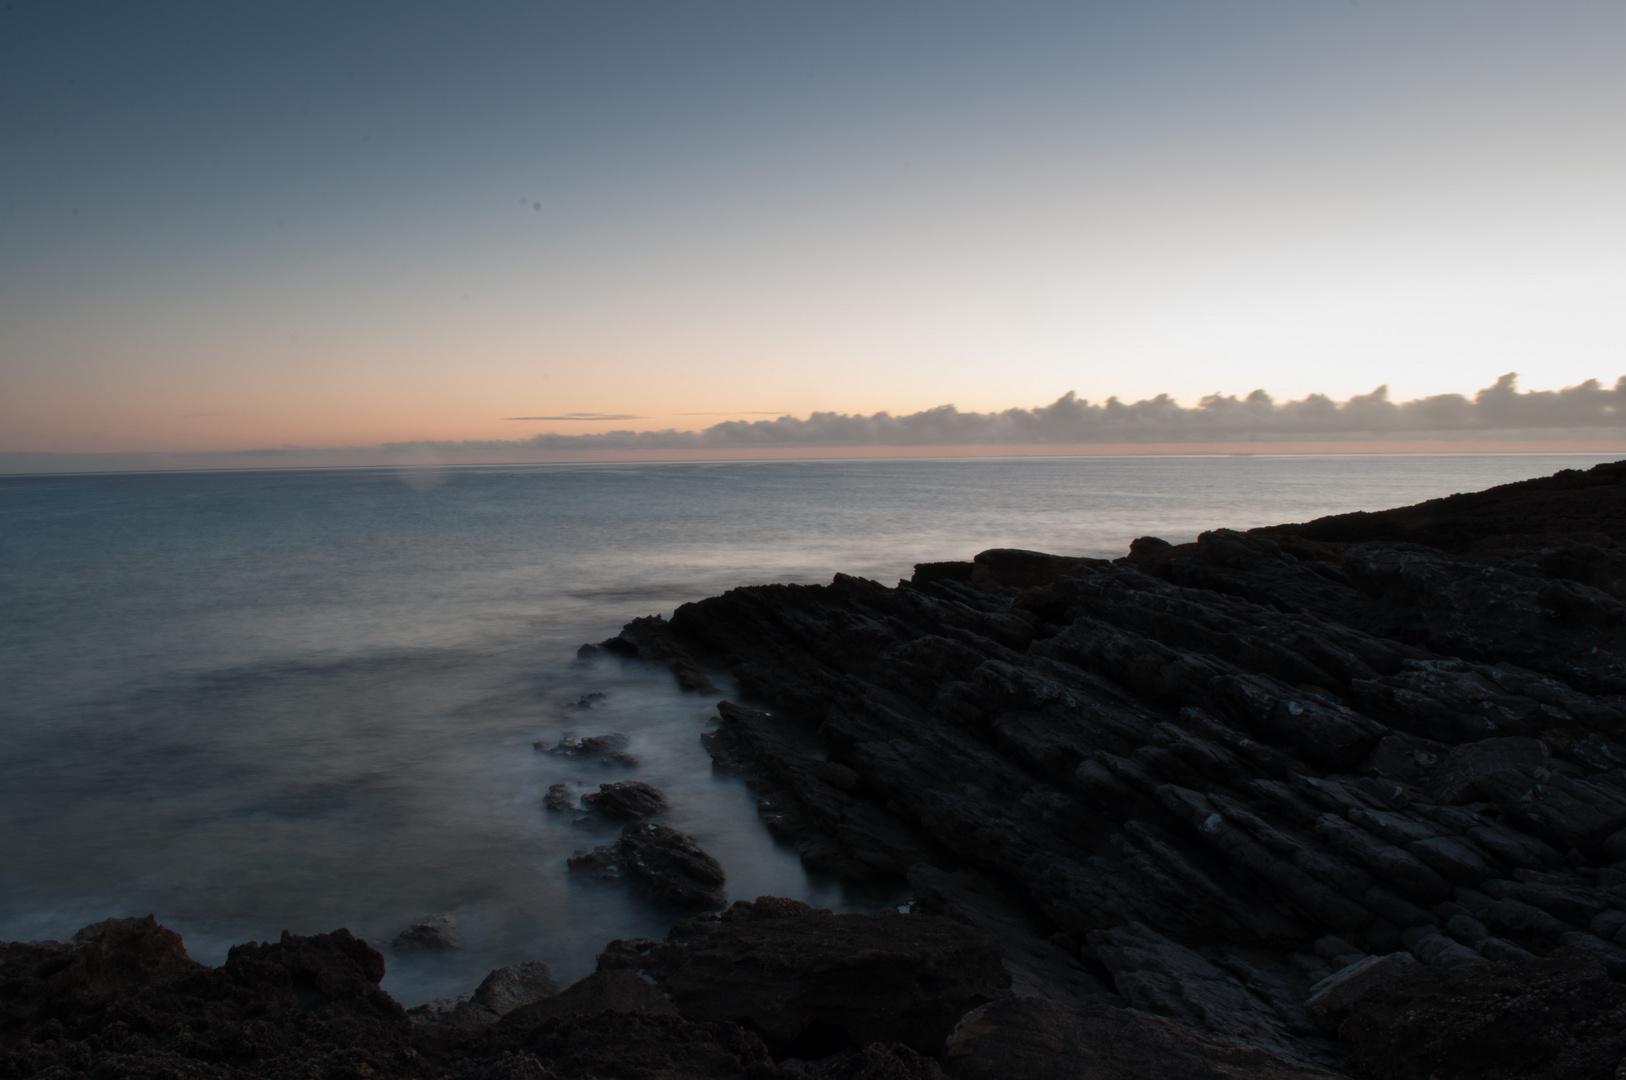 Sonnenaufgang in Cala Mesquida